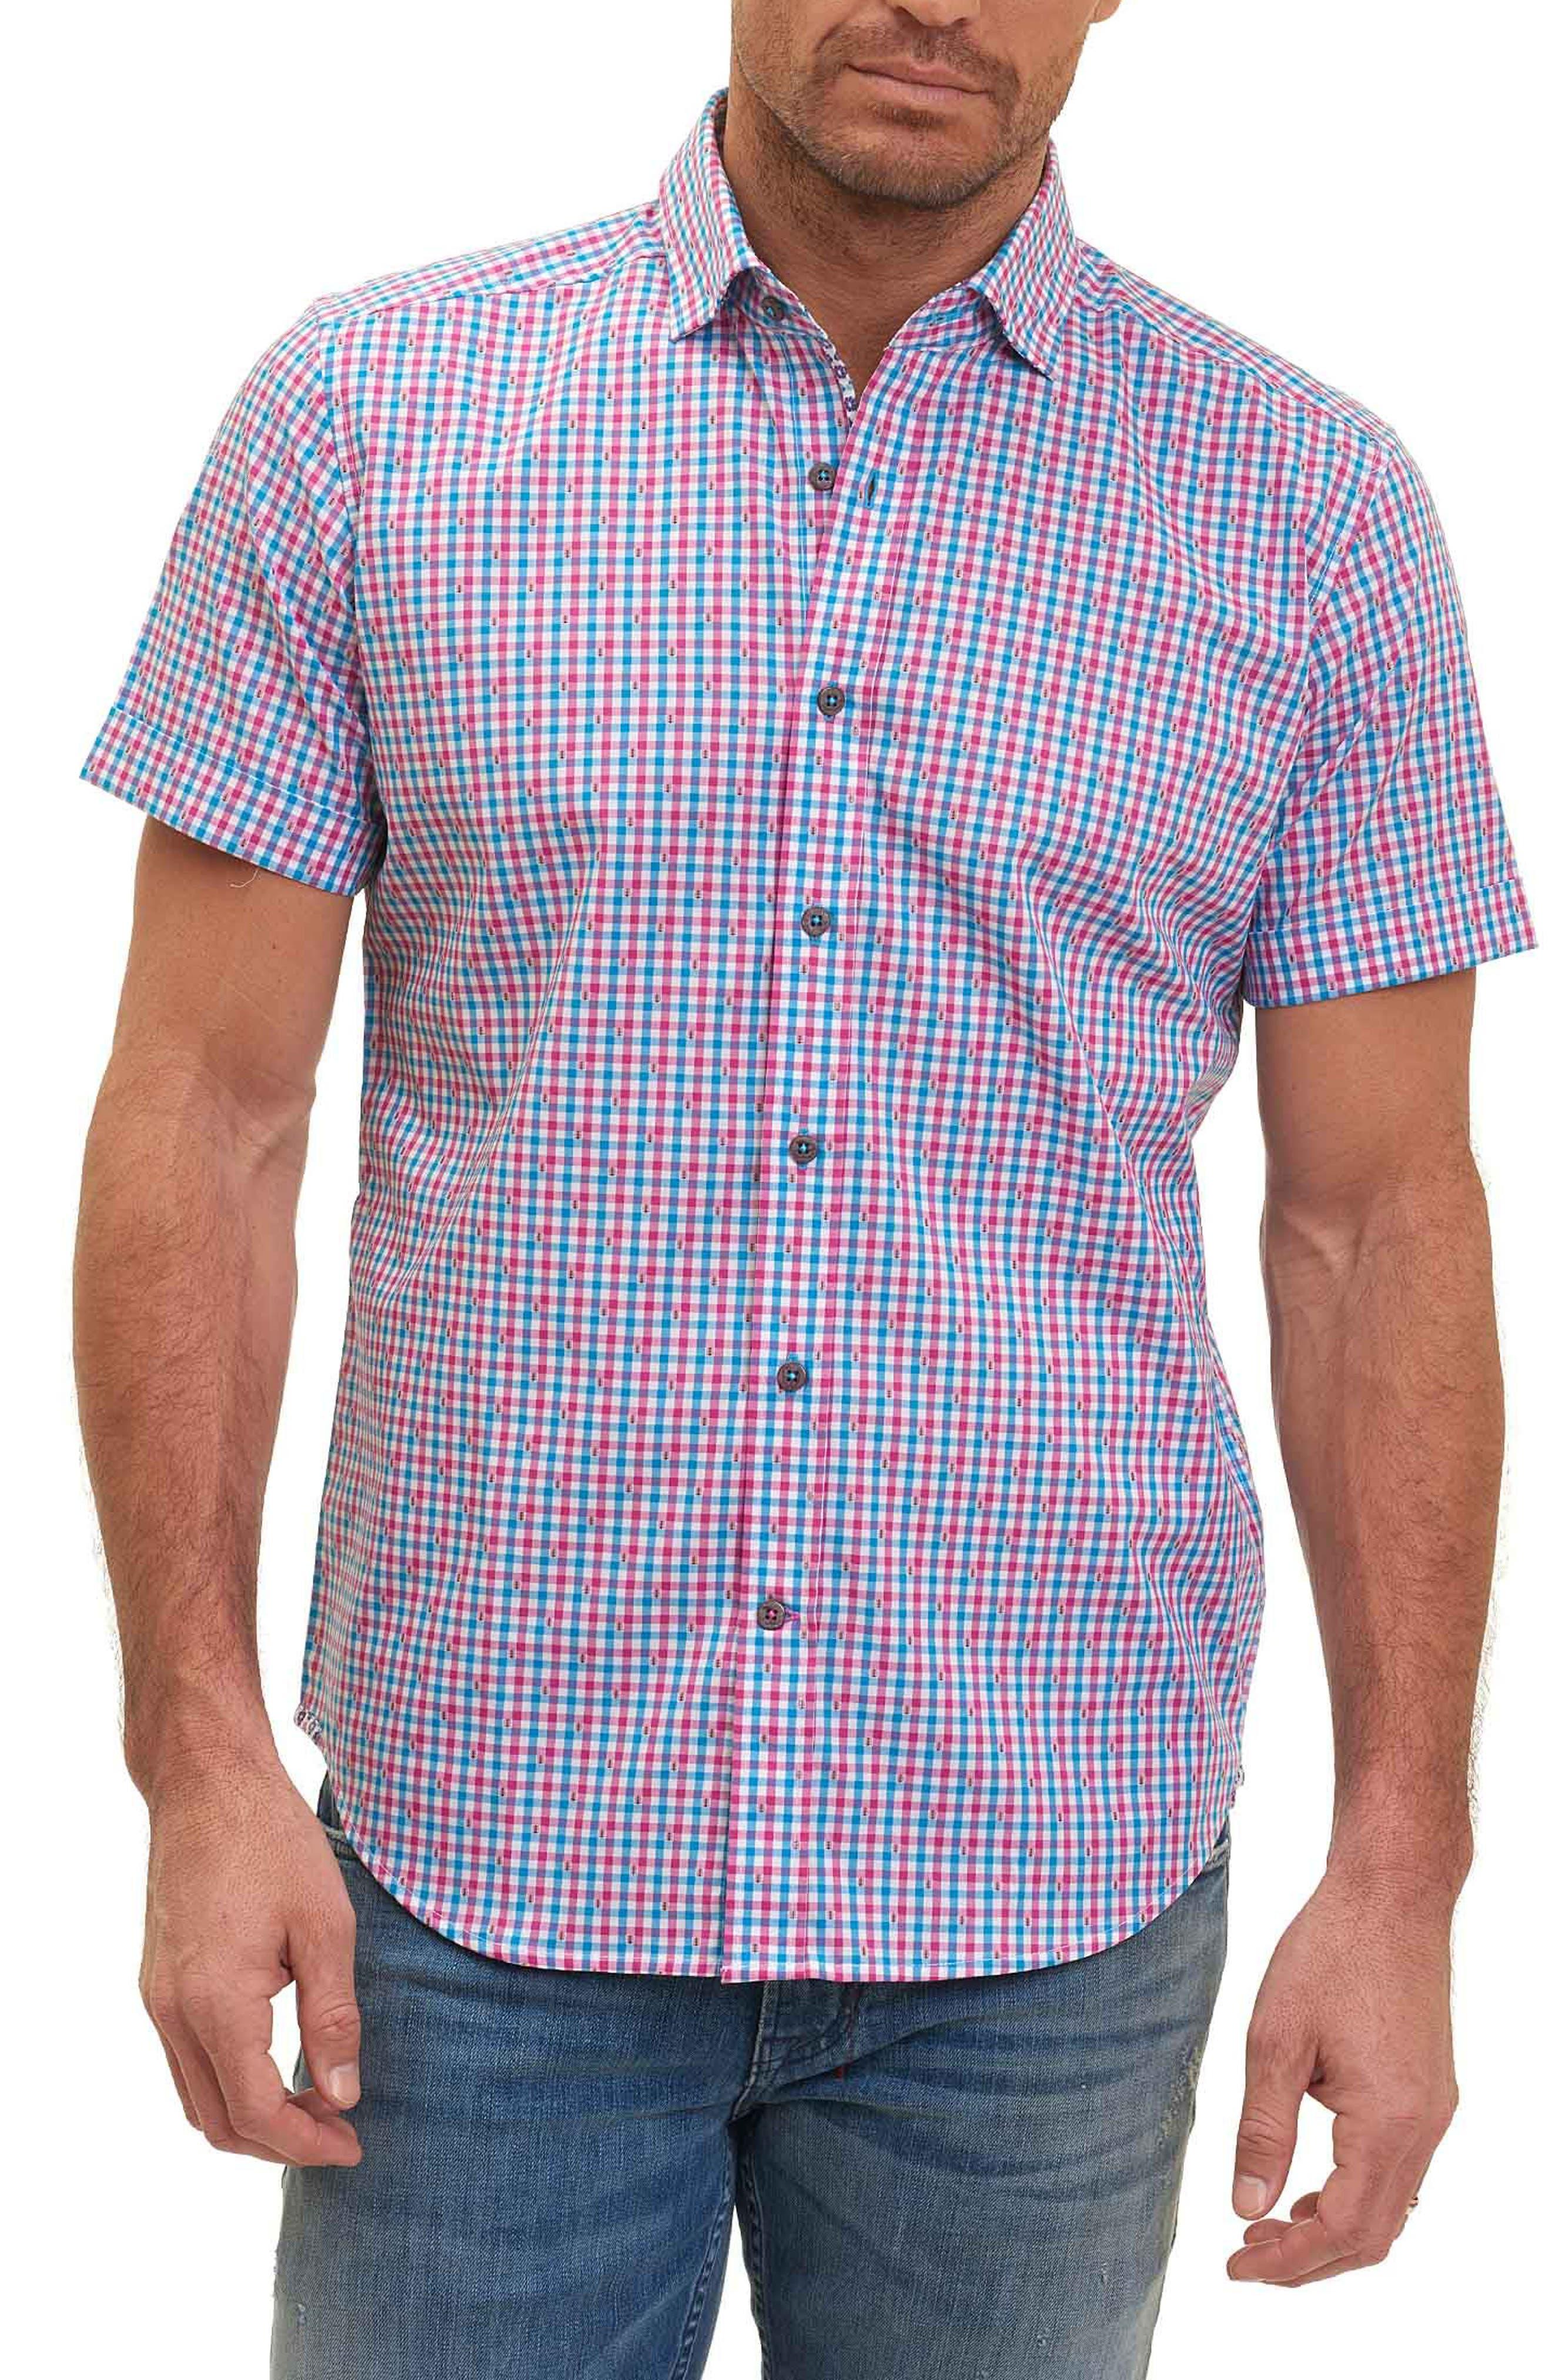 Makai Tailored Fit Gingham Sport Shirt,                         Main,                         color, 460